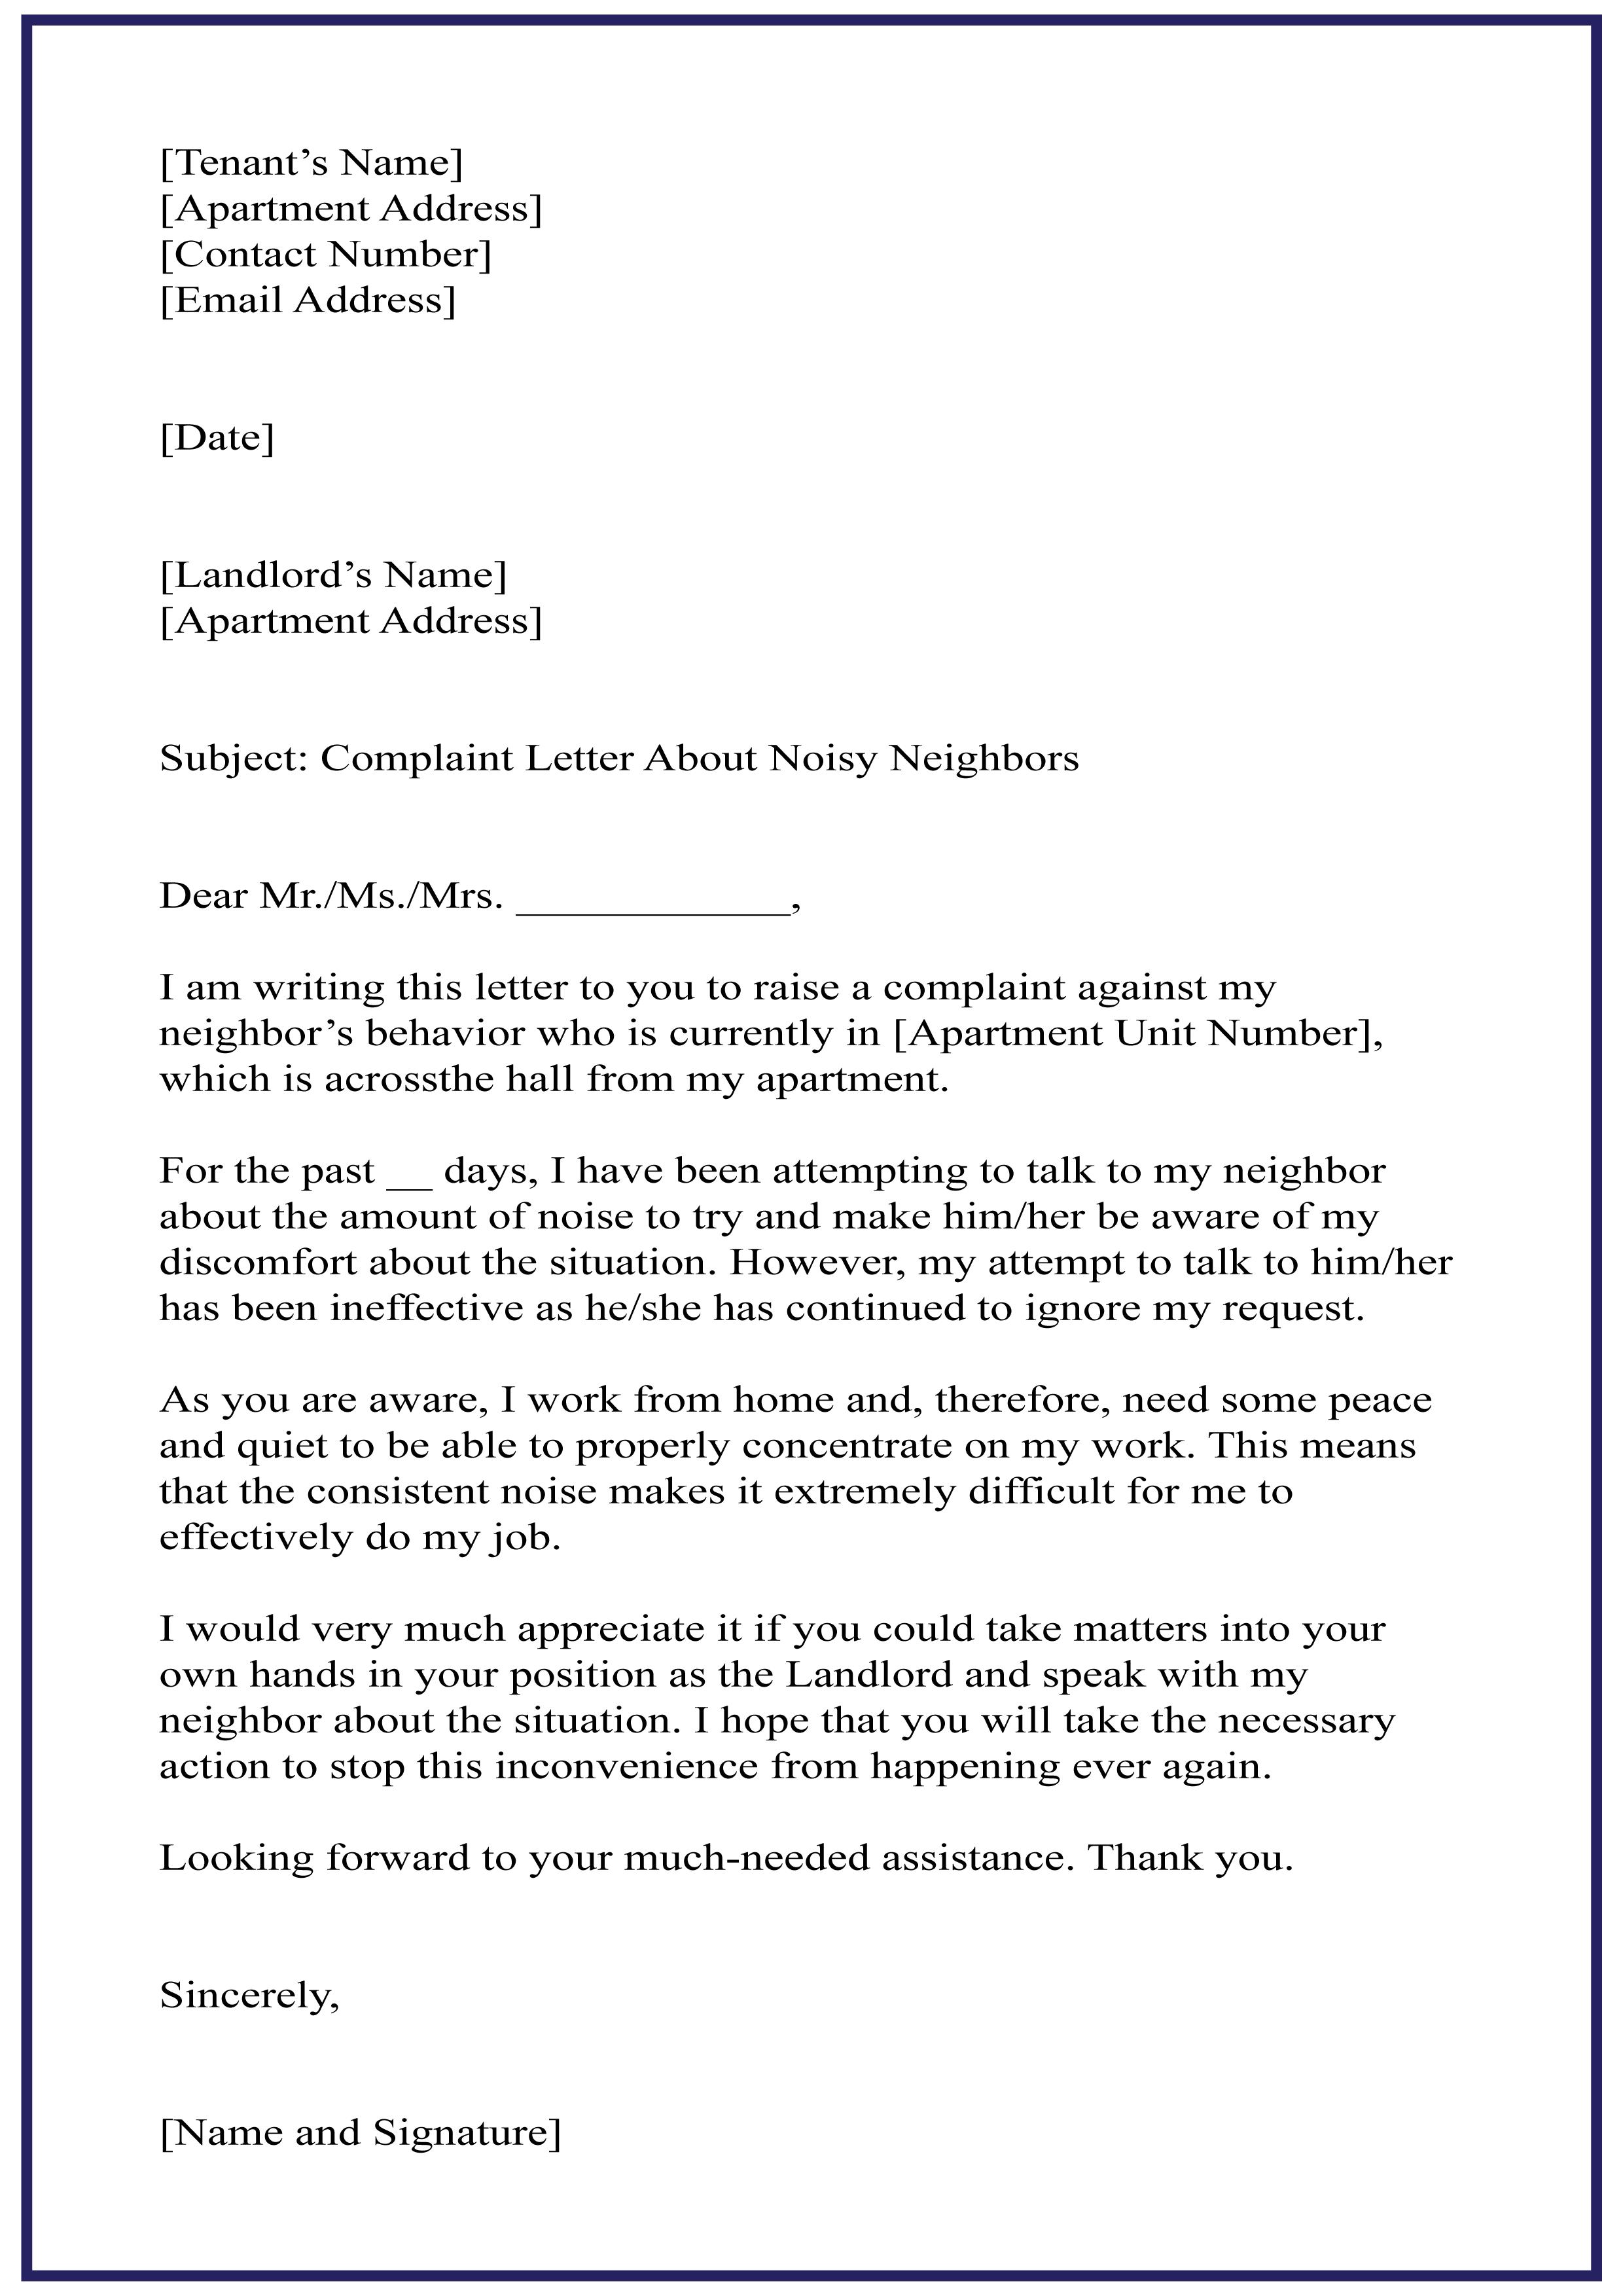 Letter of Complaint Sample